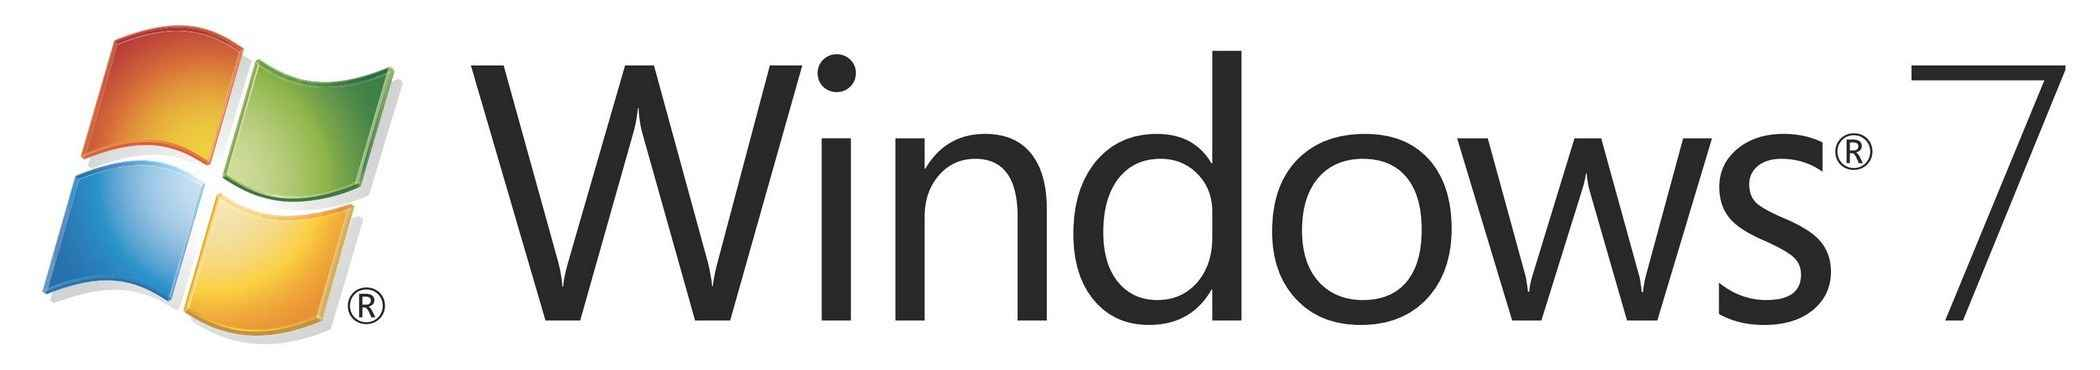 windows 7 logo vector [eps file] vector eps free download, logo